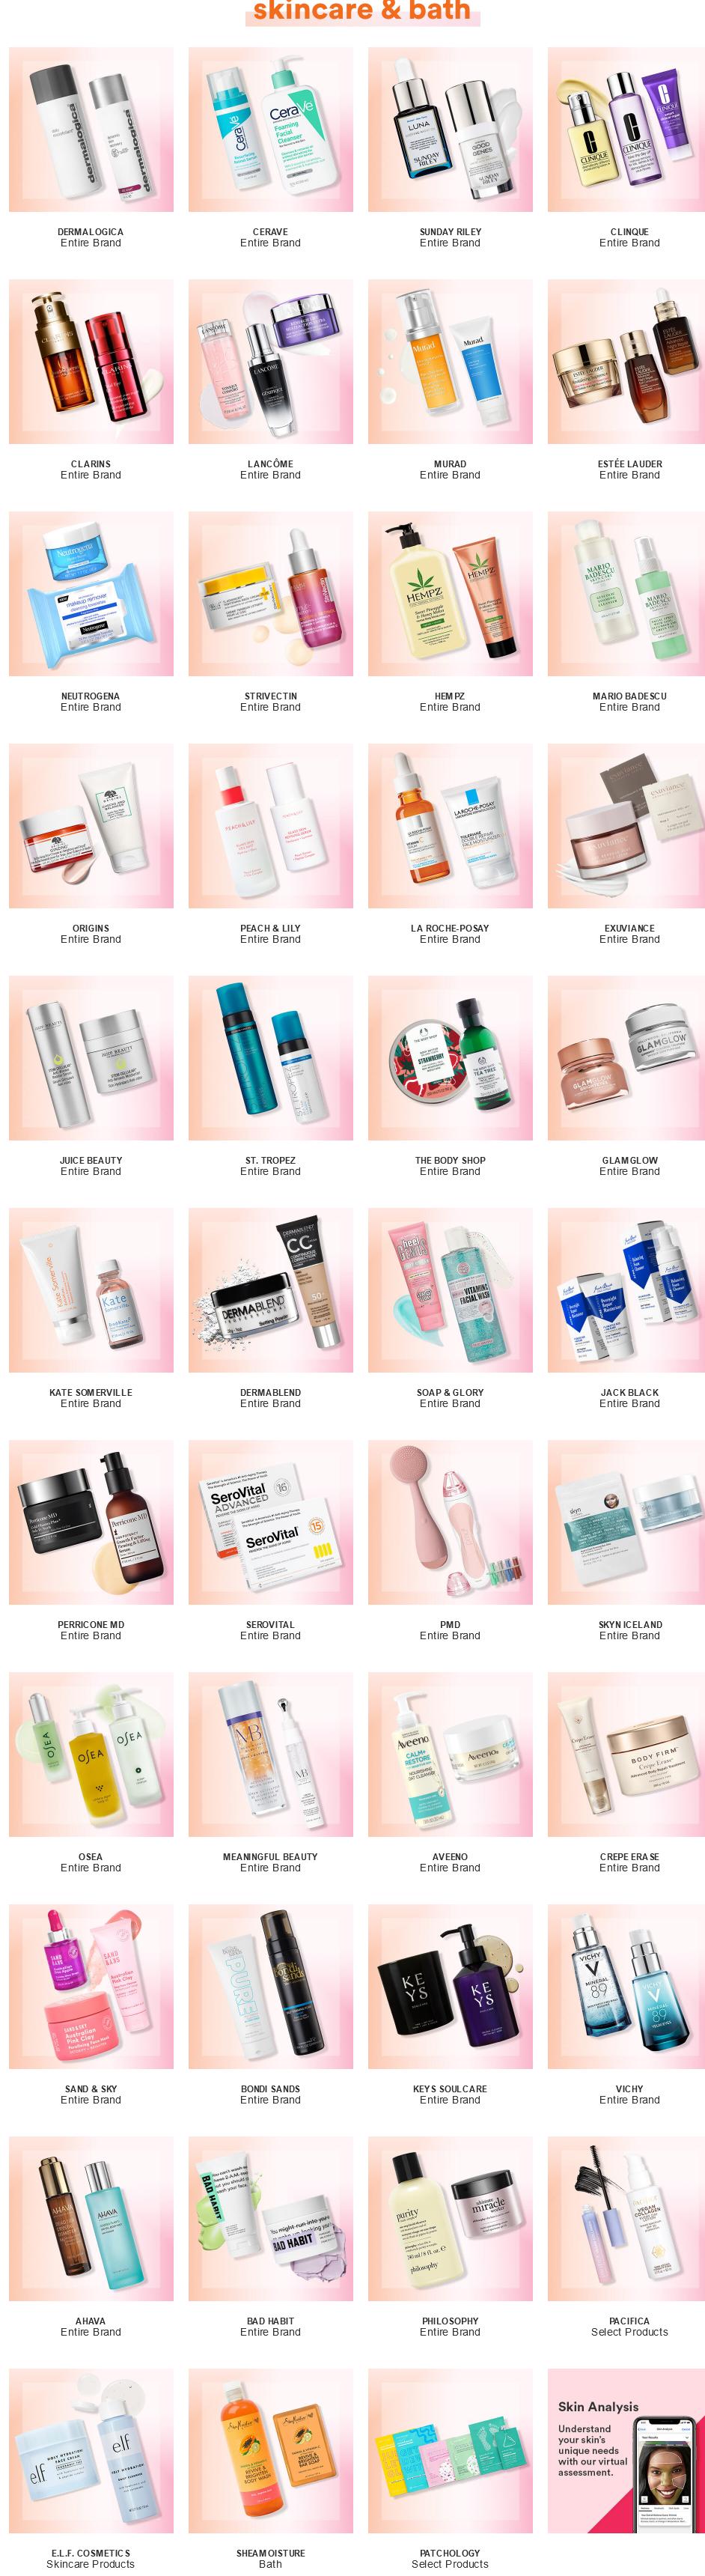 Screenshot 2021-08-16 Ultamate Rewards Member Appreciation Day Ulta Beauty icangwp (3)